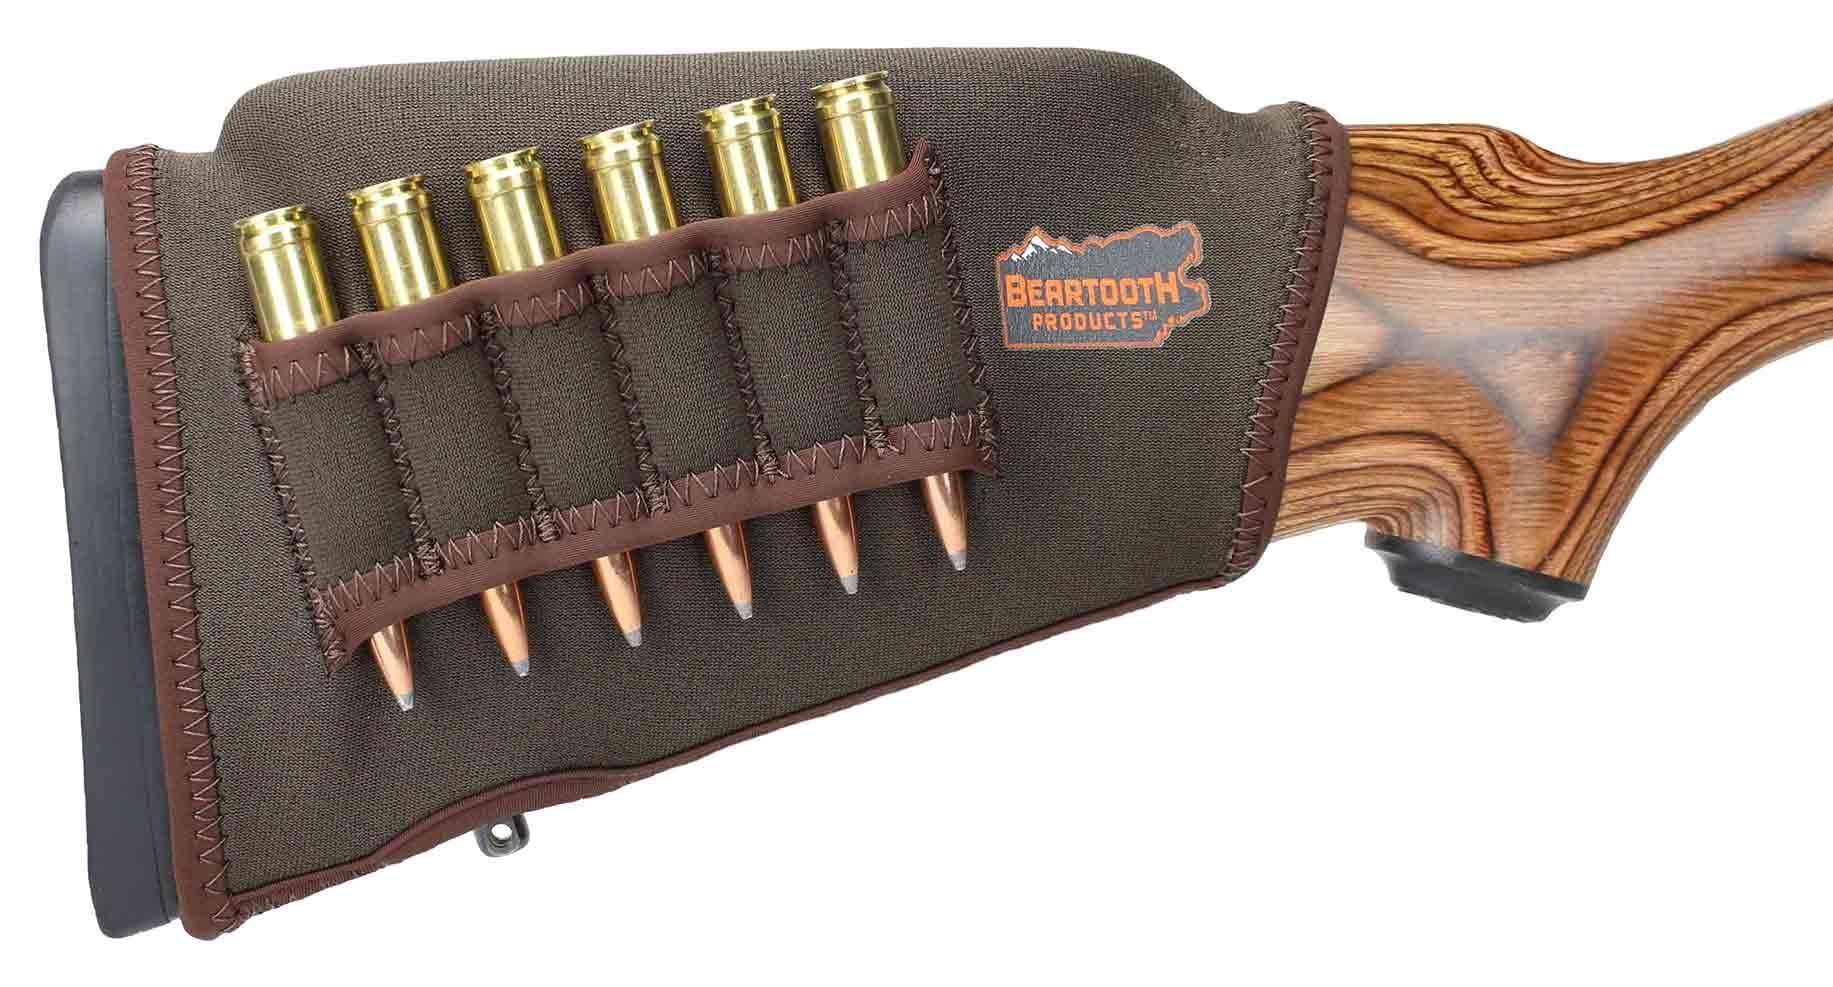 Beartooth Comb Raising Kit 2.0 - Premium Neoprene Gun Stock Cover + (5) Hi-Density Foam Inserts - Rifle Model (Brown - Left-Handed) by Beartooth